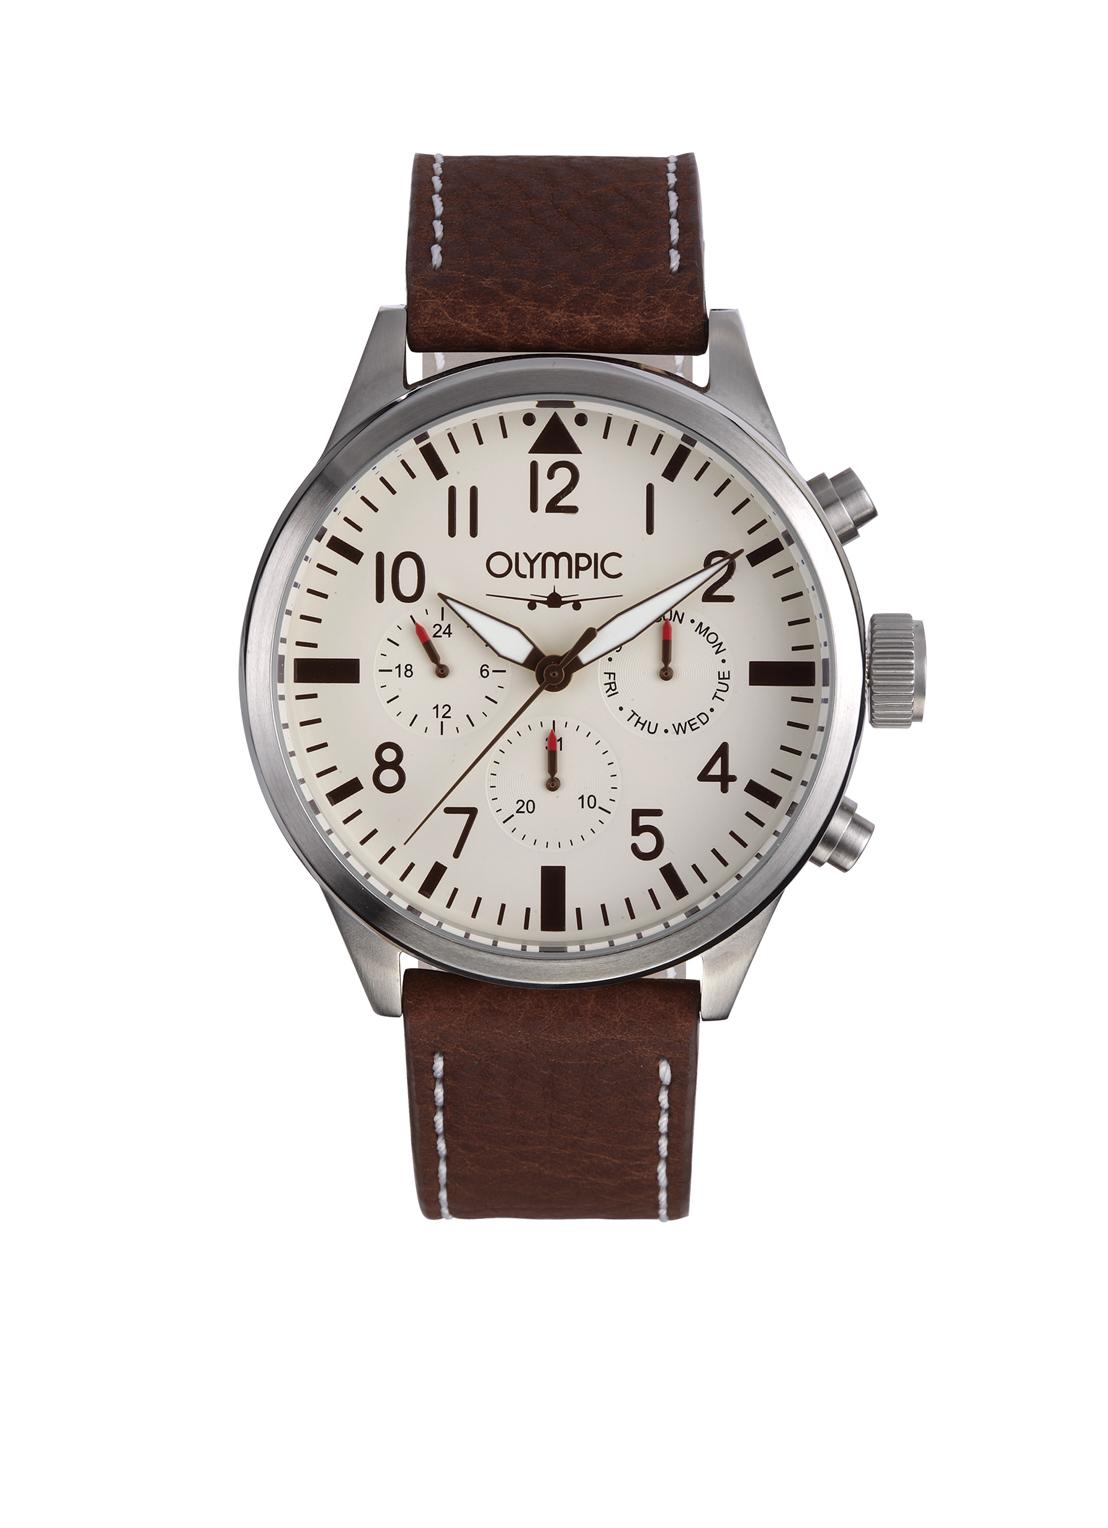 Olympic - Horloge - Juwelier Kicken - Simpelveld